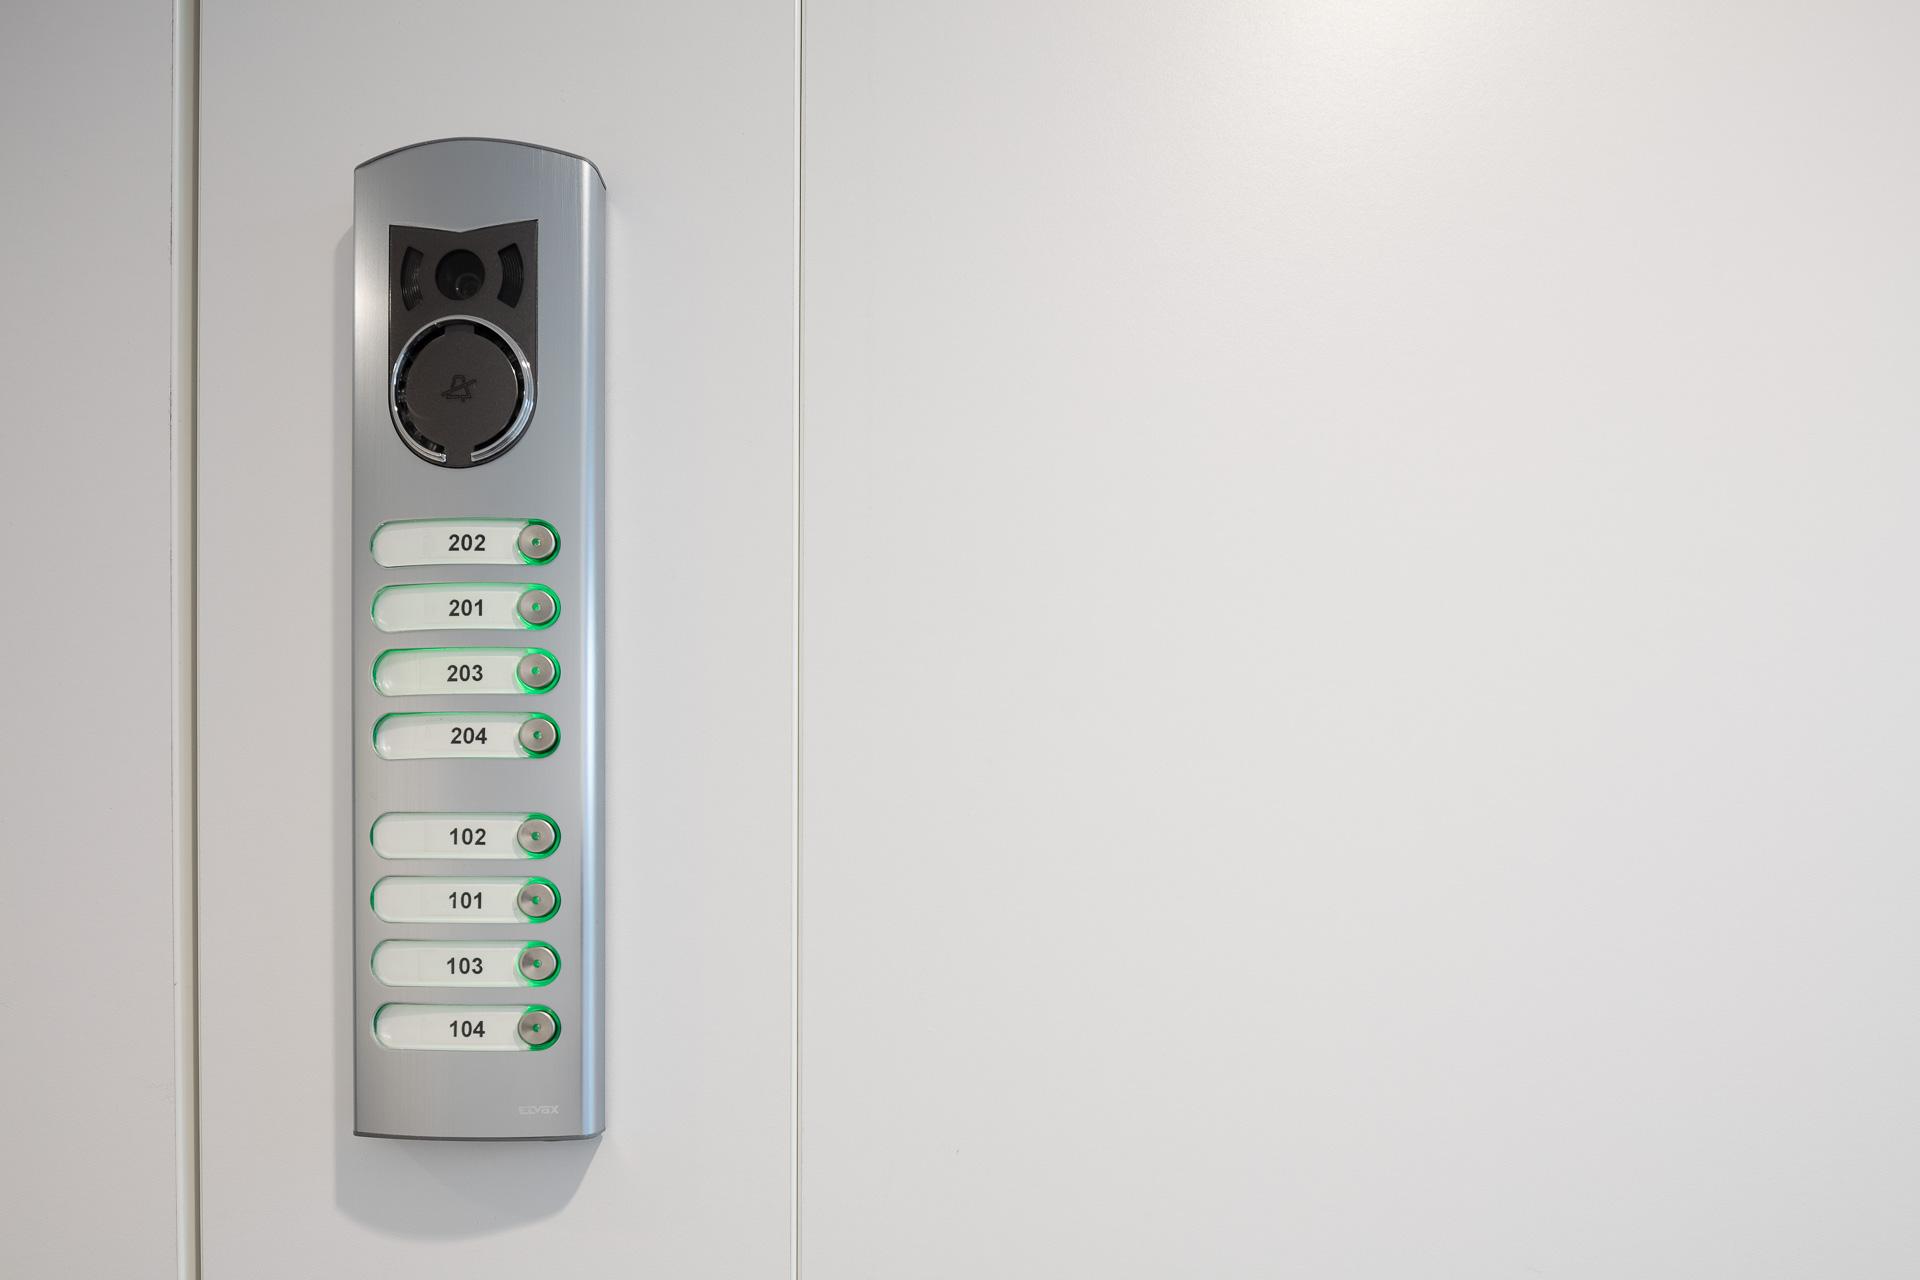 interieurfotografie-dtonic-electro-verbeke-full-011